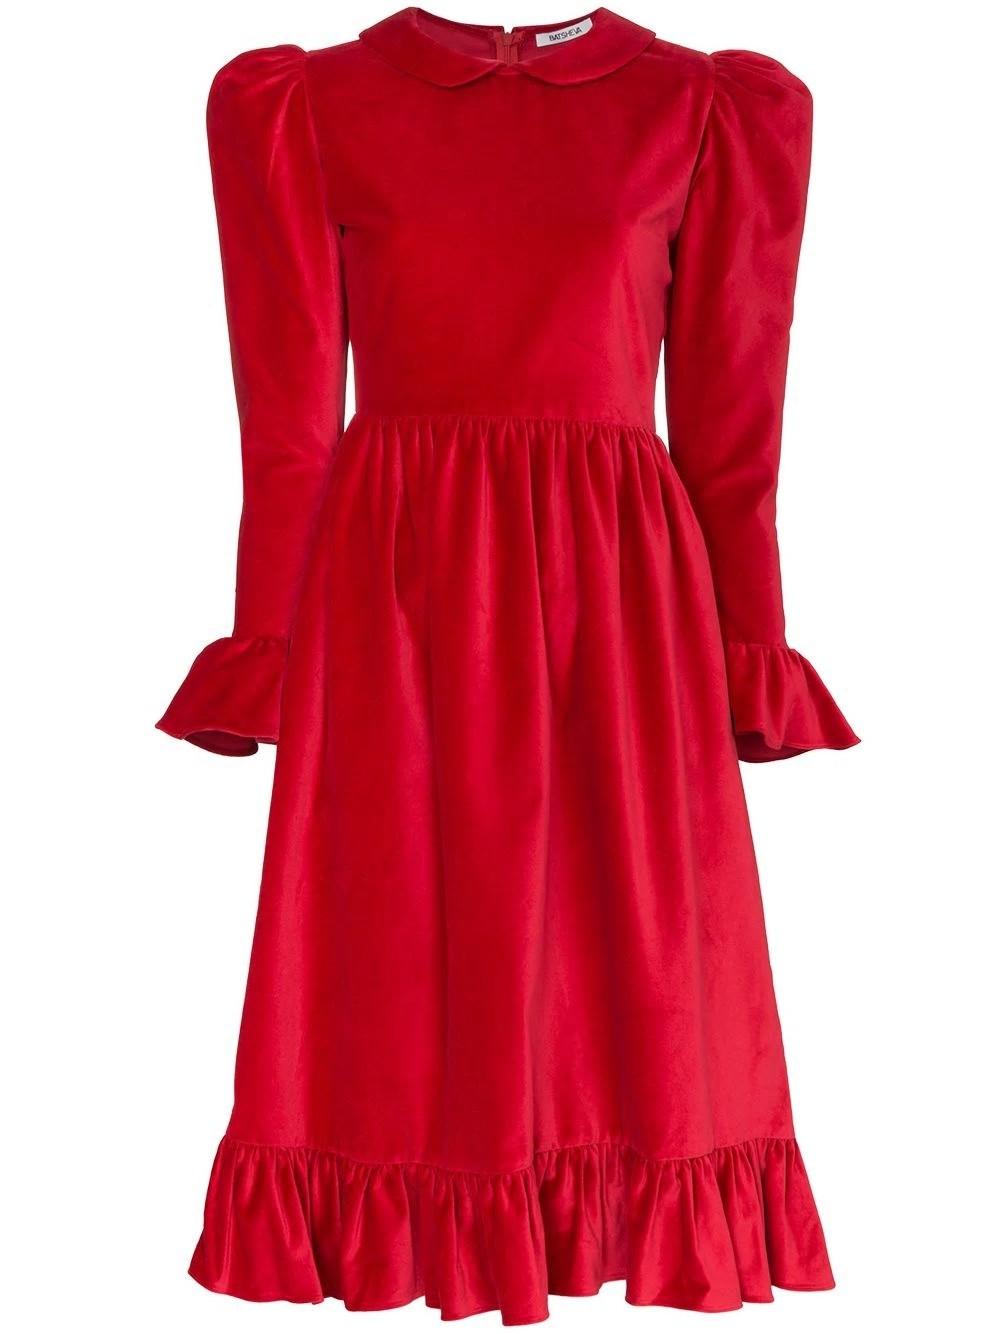 BH W 0029PETER PAN DRESS RED